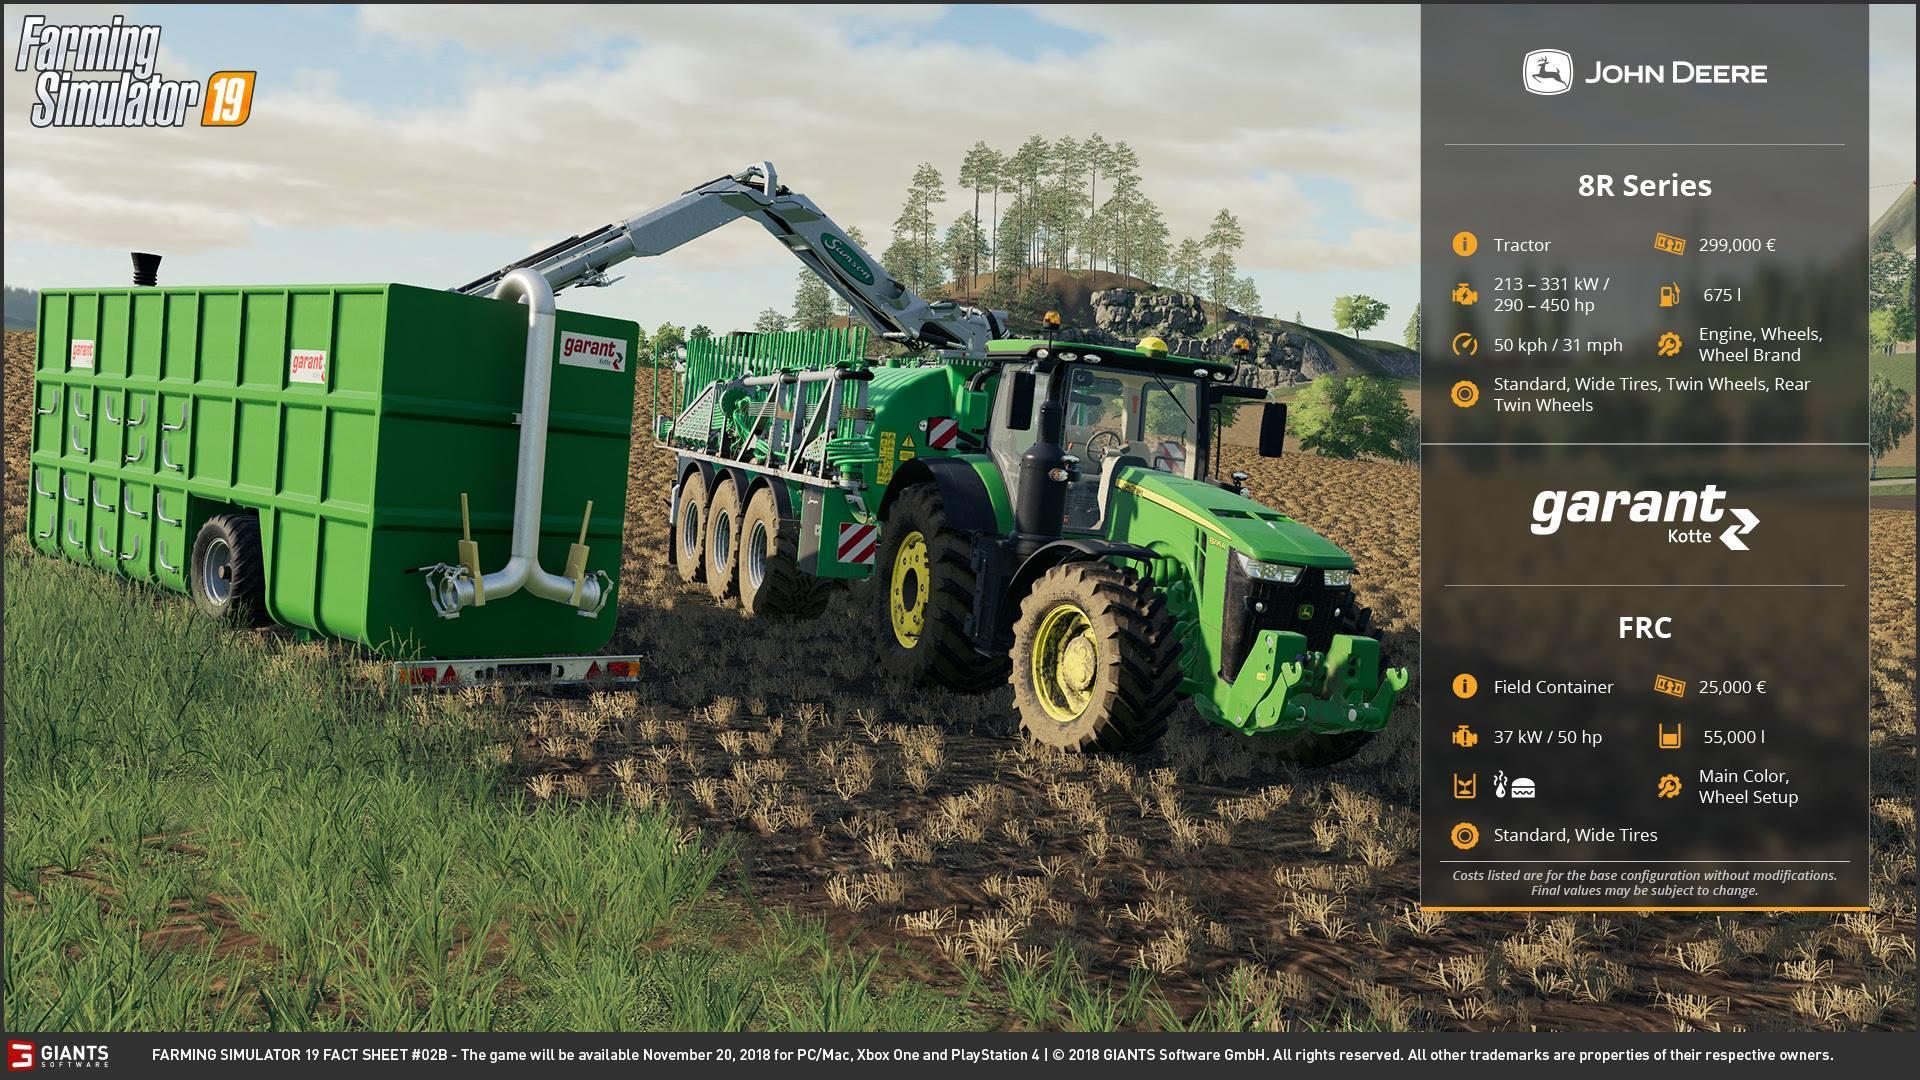 Farming simulator 19 FACT SHEET #2 - Modhub us